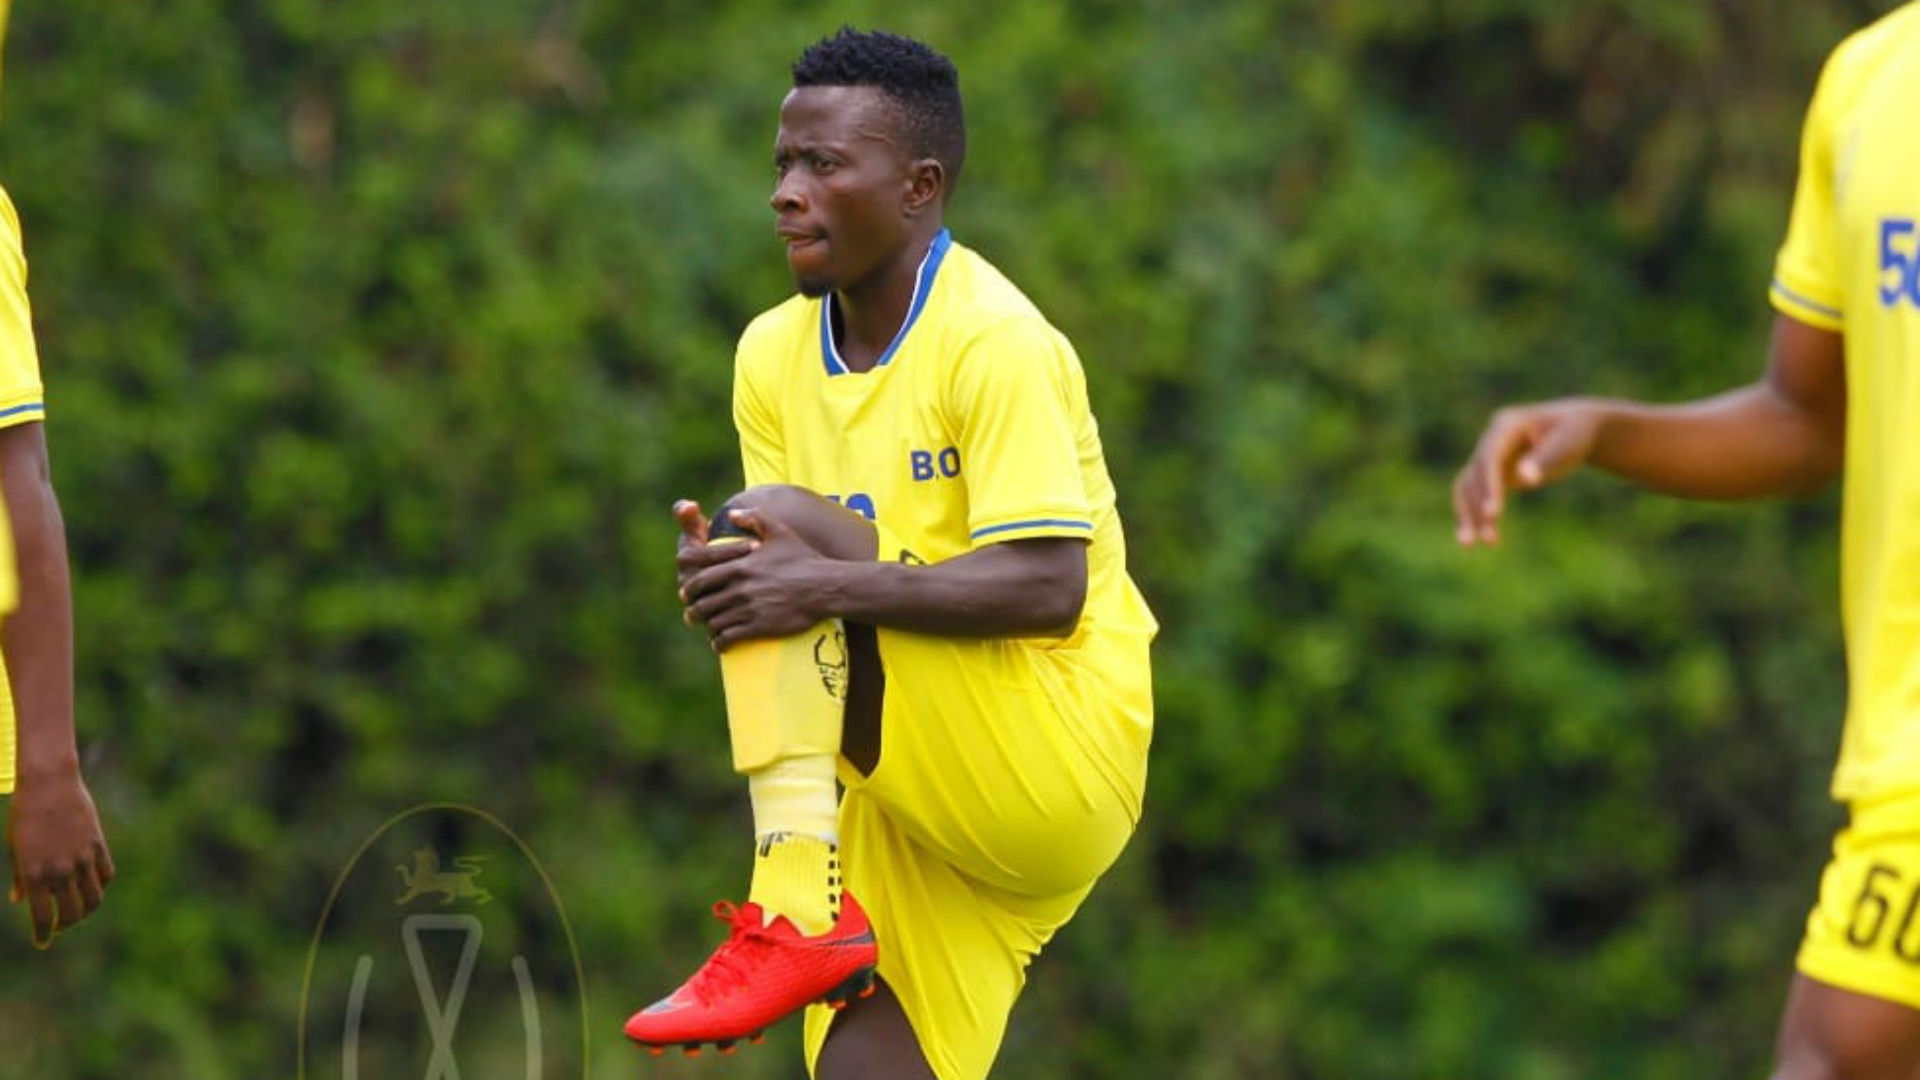 Gor Mahia's Omondi & Odhiambo and FKF Premier League stars to watch out for